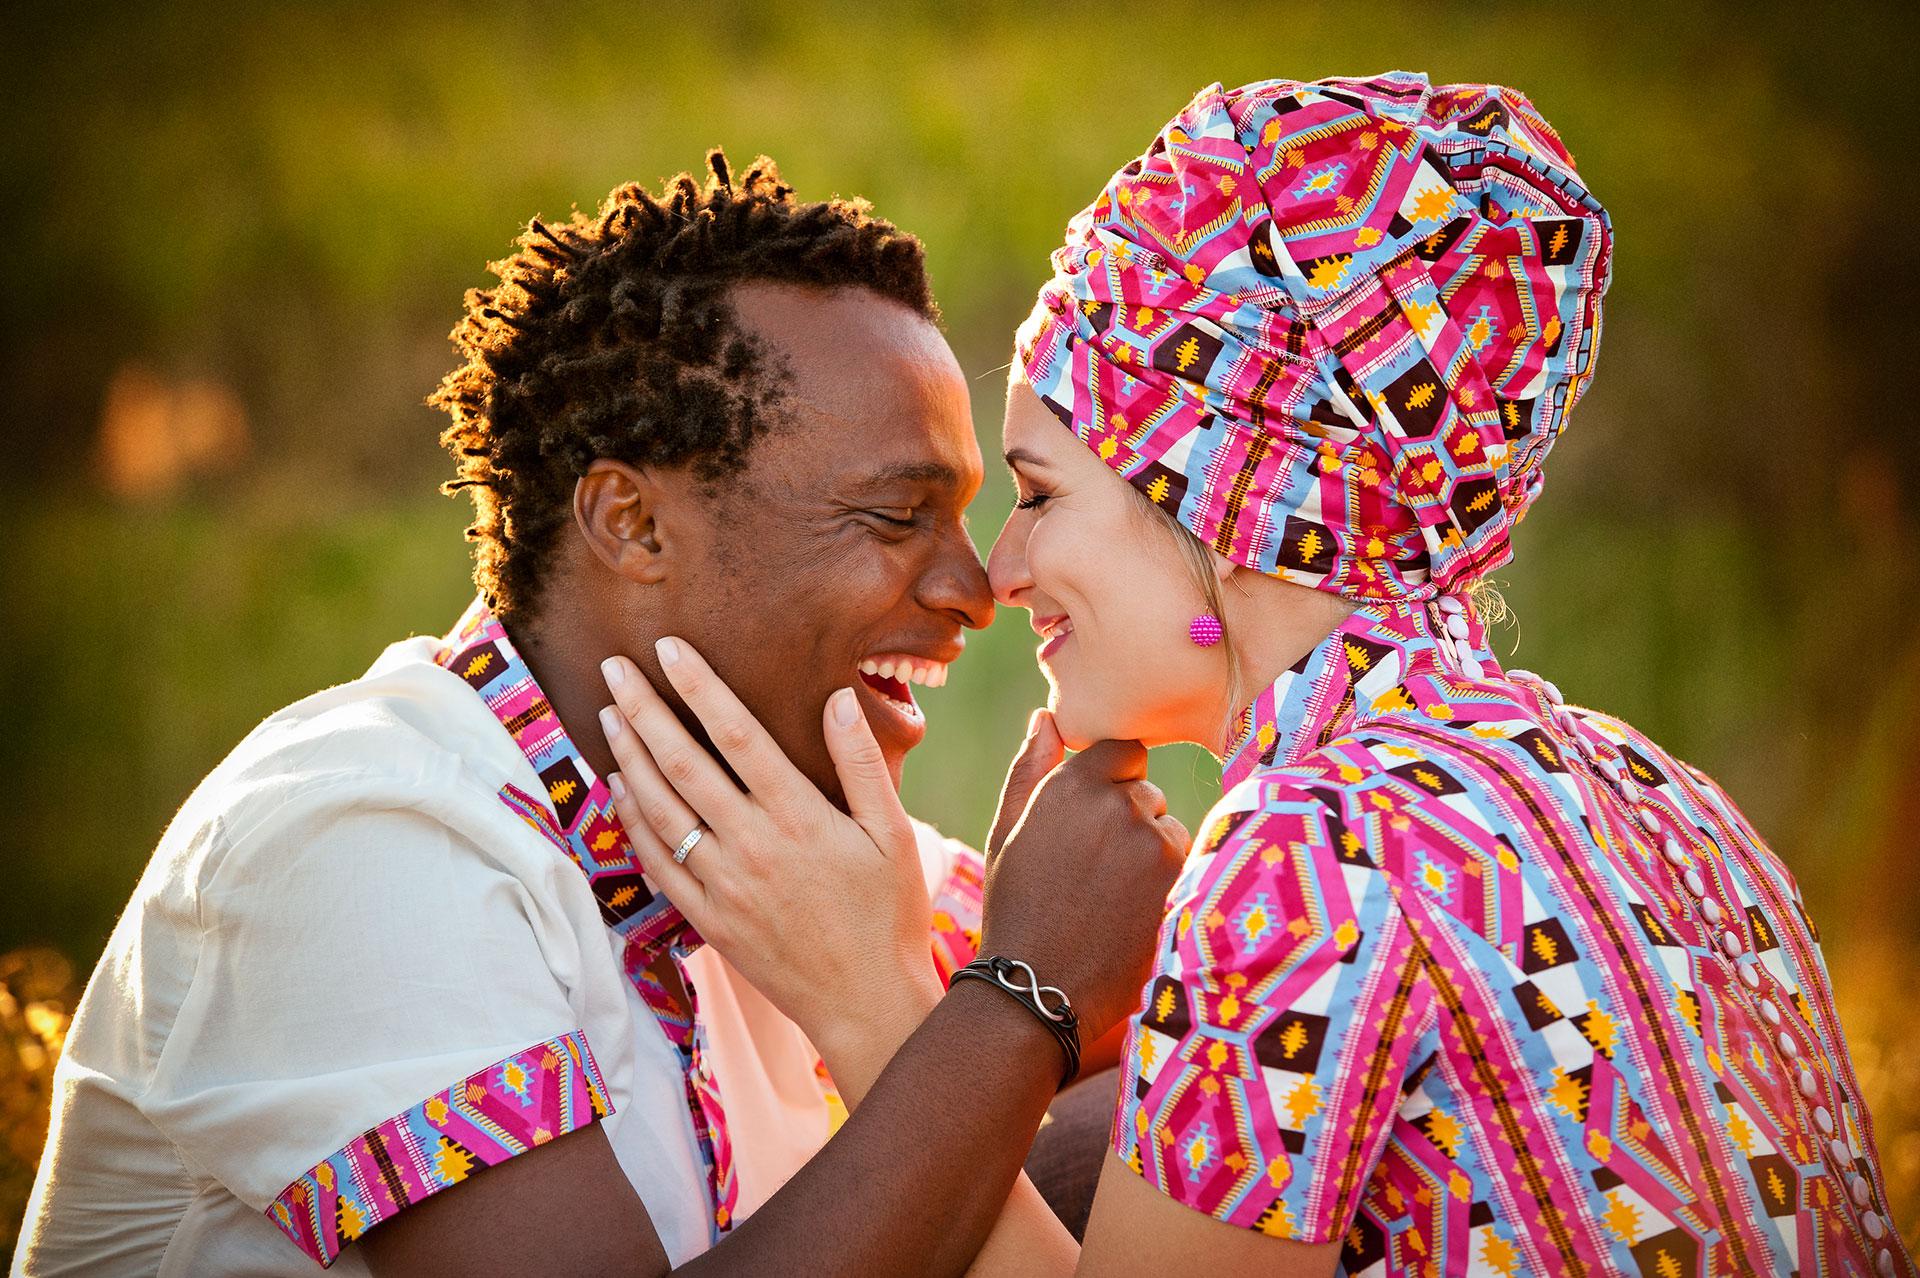 Testimonials-Top-South-African-Wedding-Photographer-Jacki-Bruniquel-001-8408